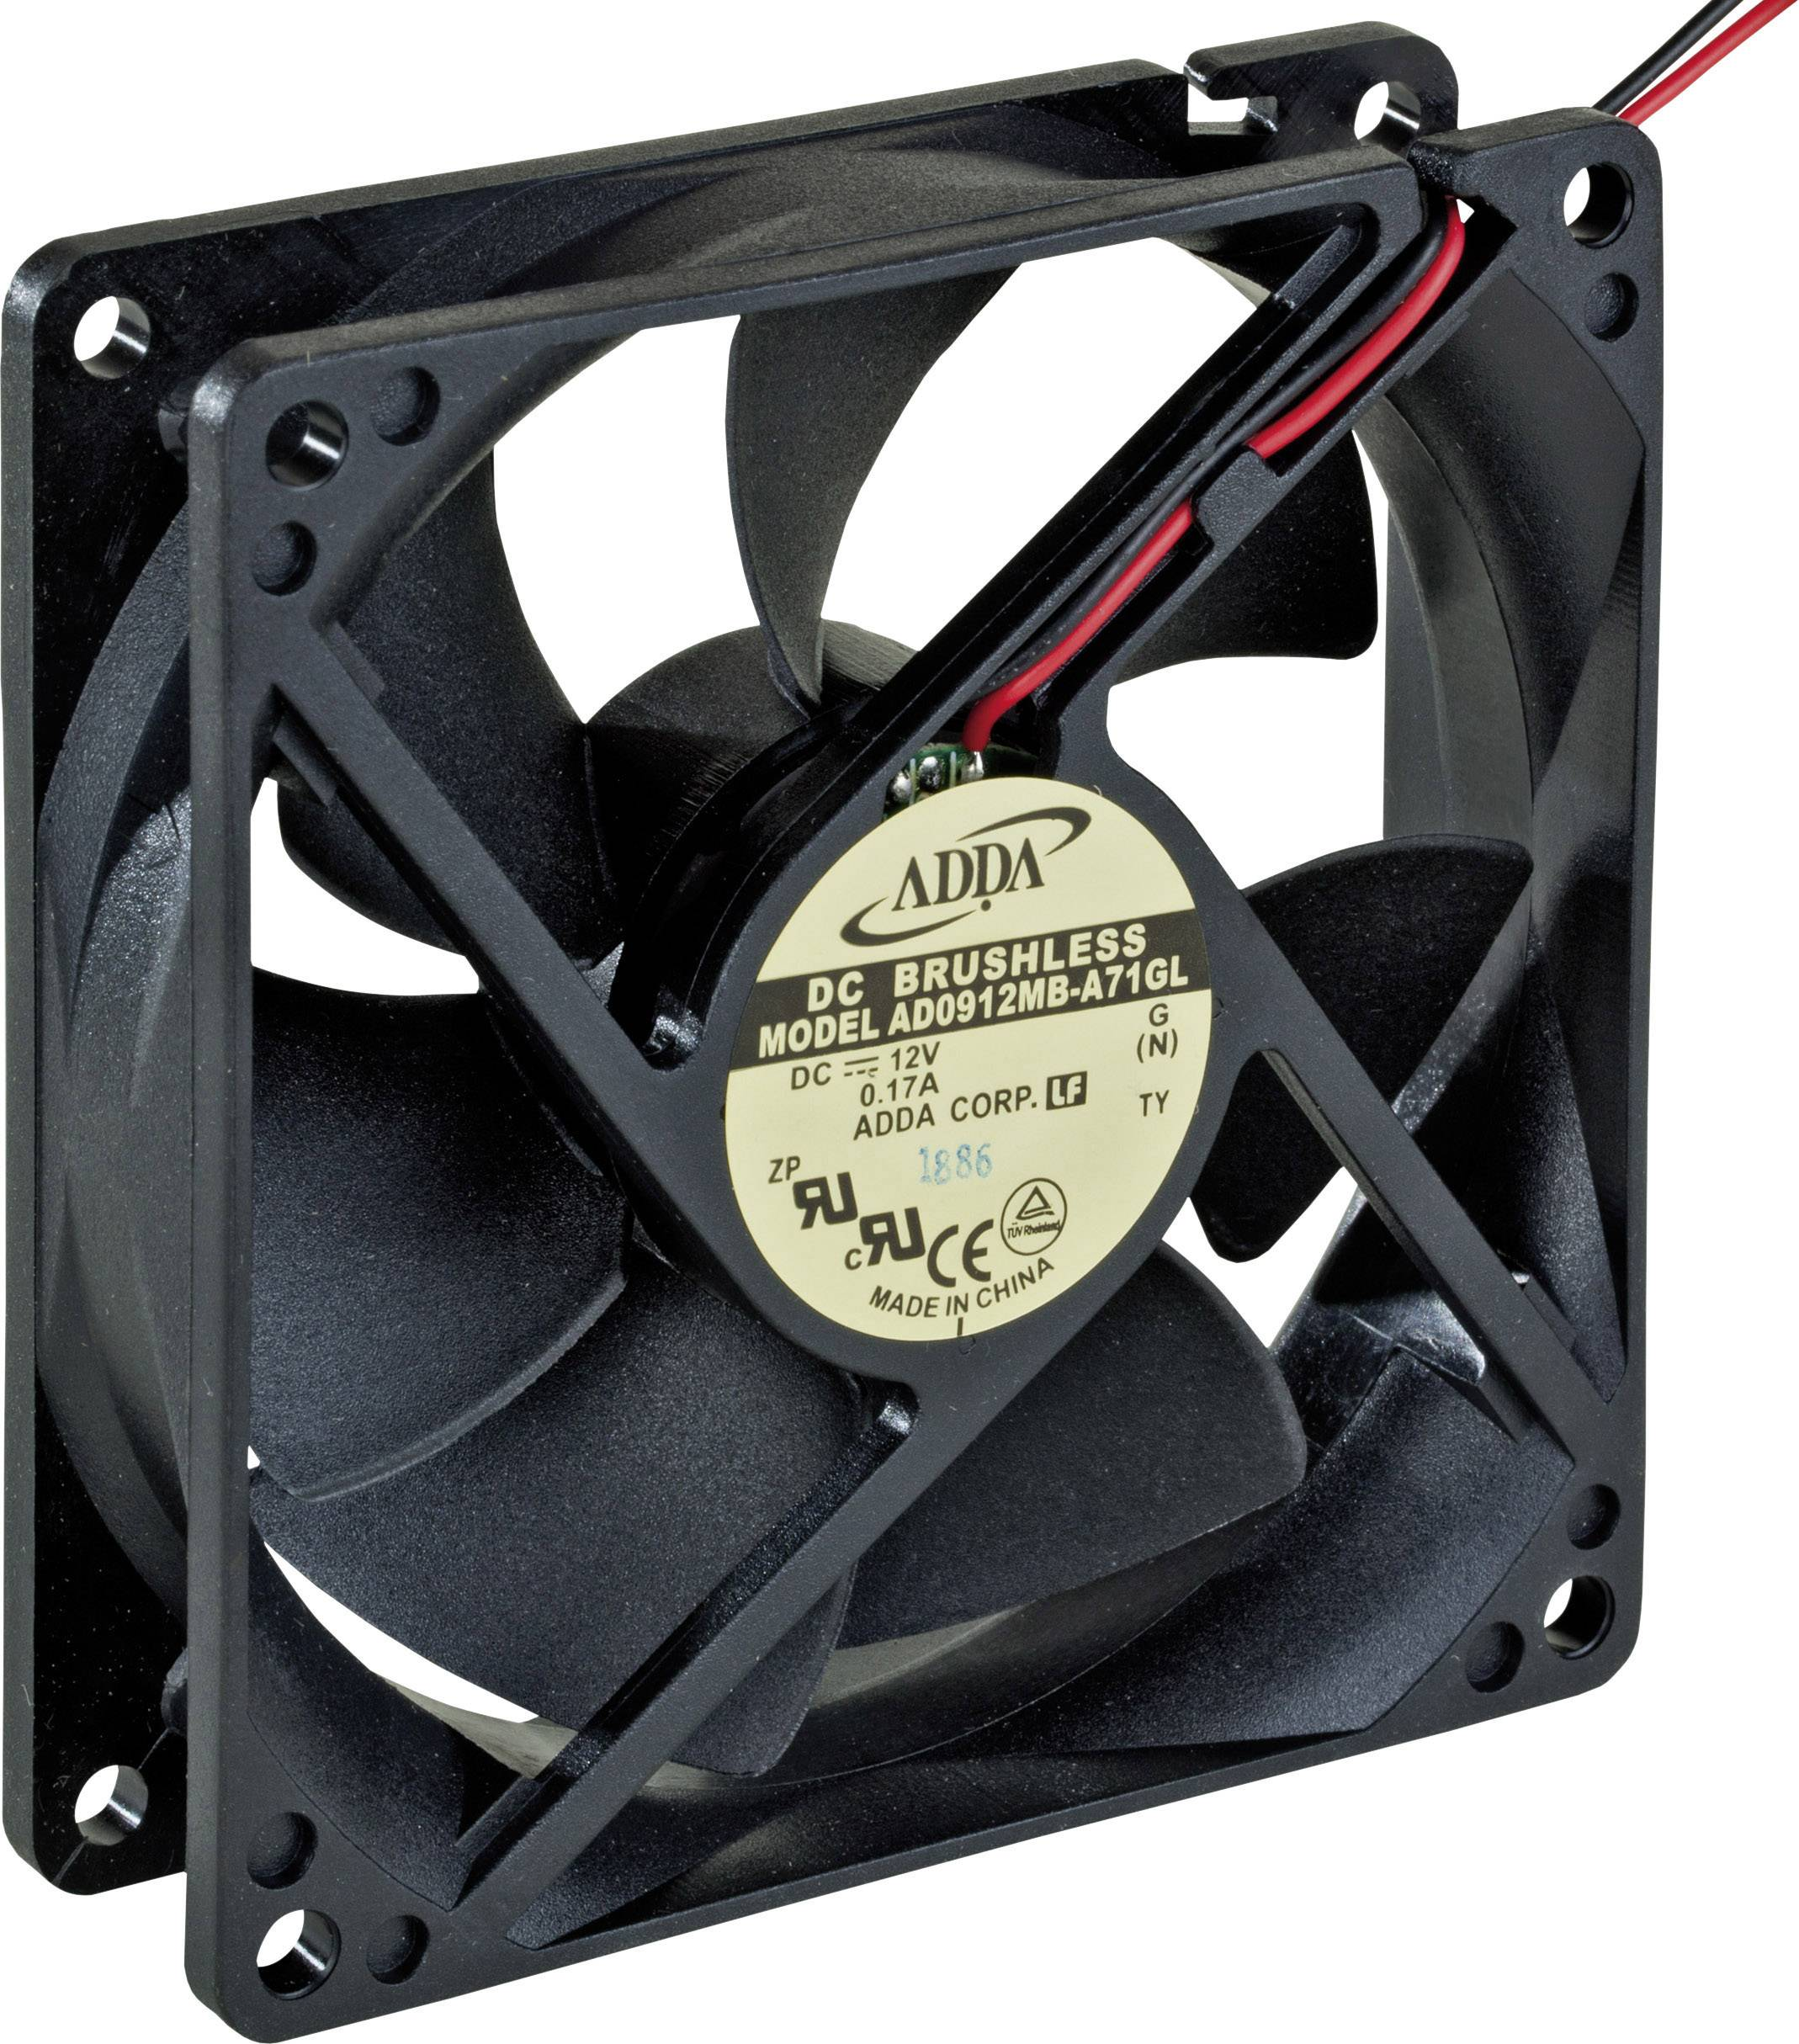 Axiálny ventilátor ADDA AD0912MB-A71GL 779232200, 12 V/DC, 92 x 92 x 25 mm